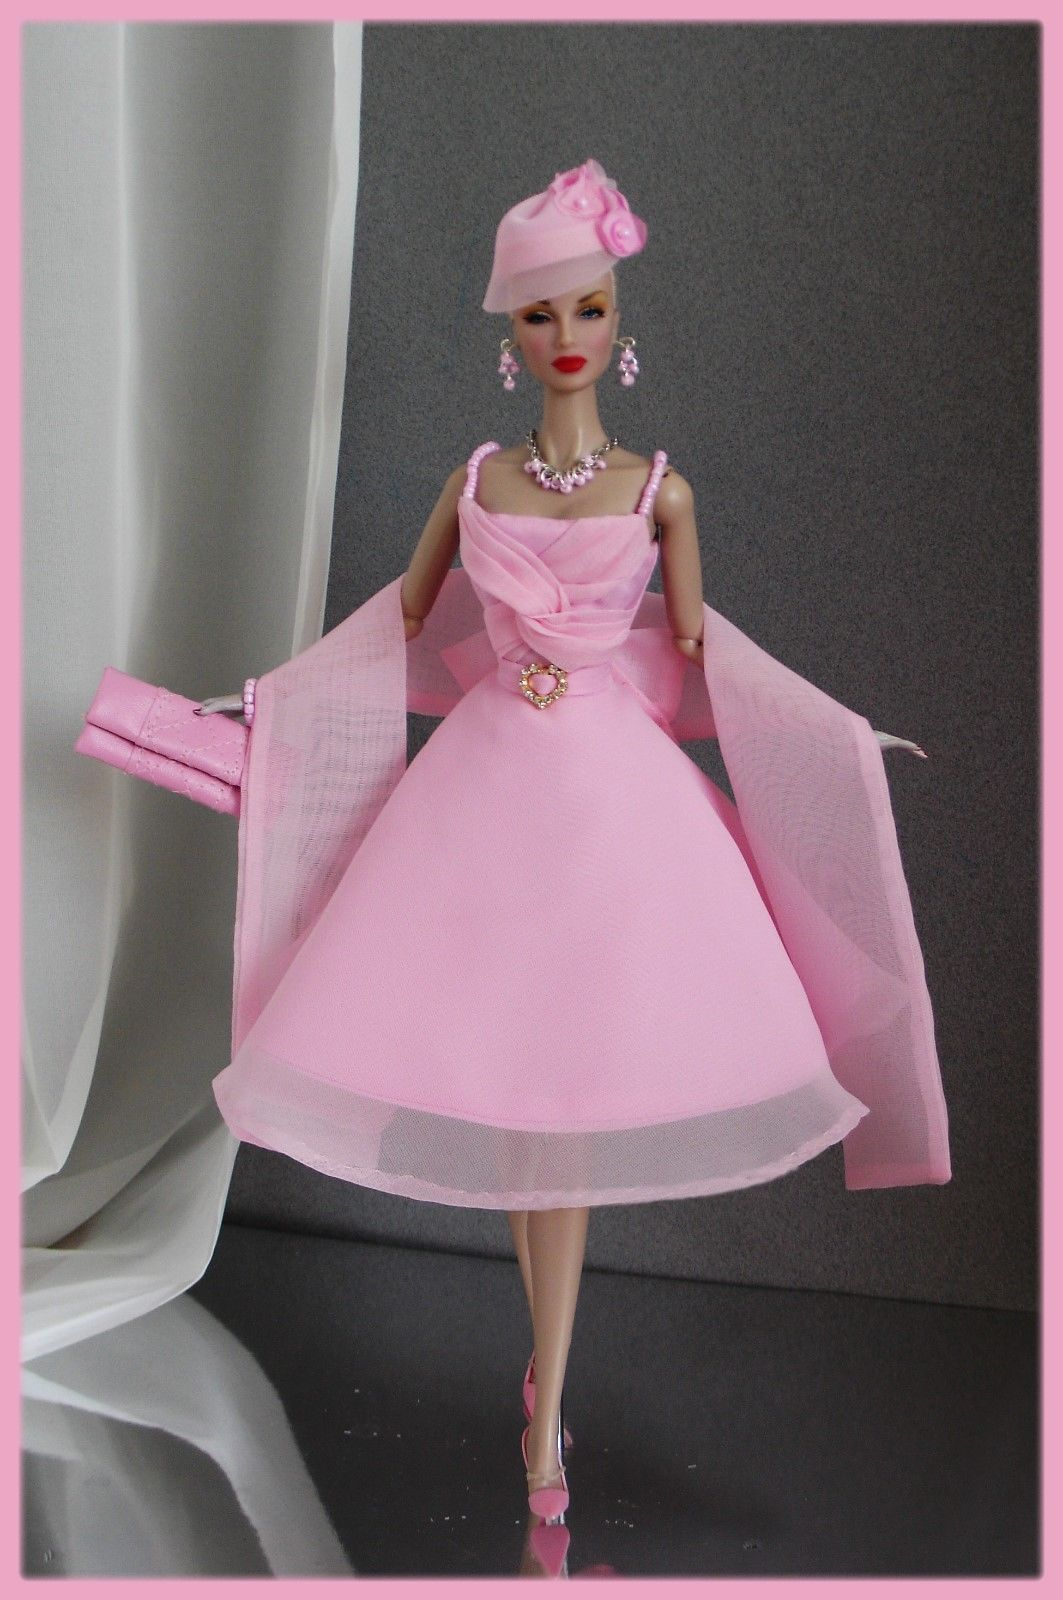 OOAK Fashions for Silkstone / Fashion Royalty / Vintage barbie ...